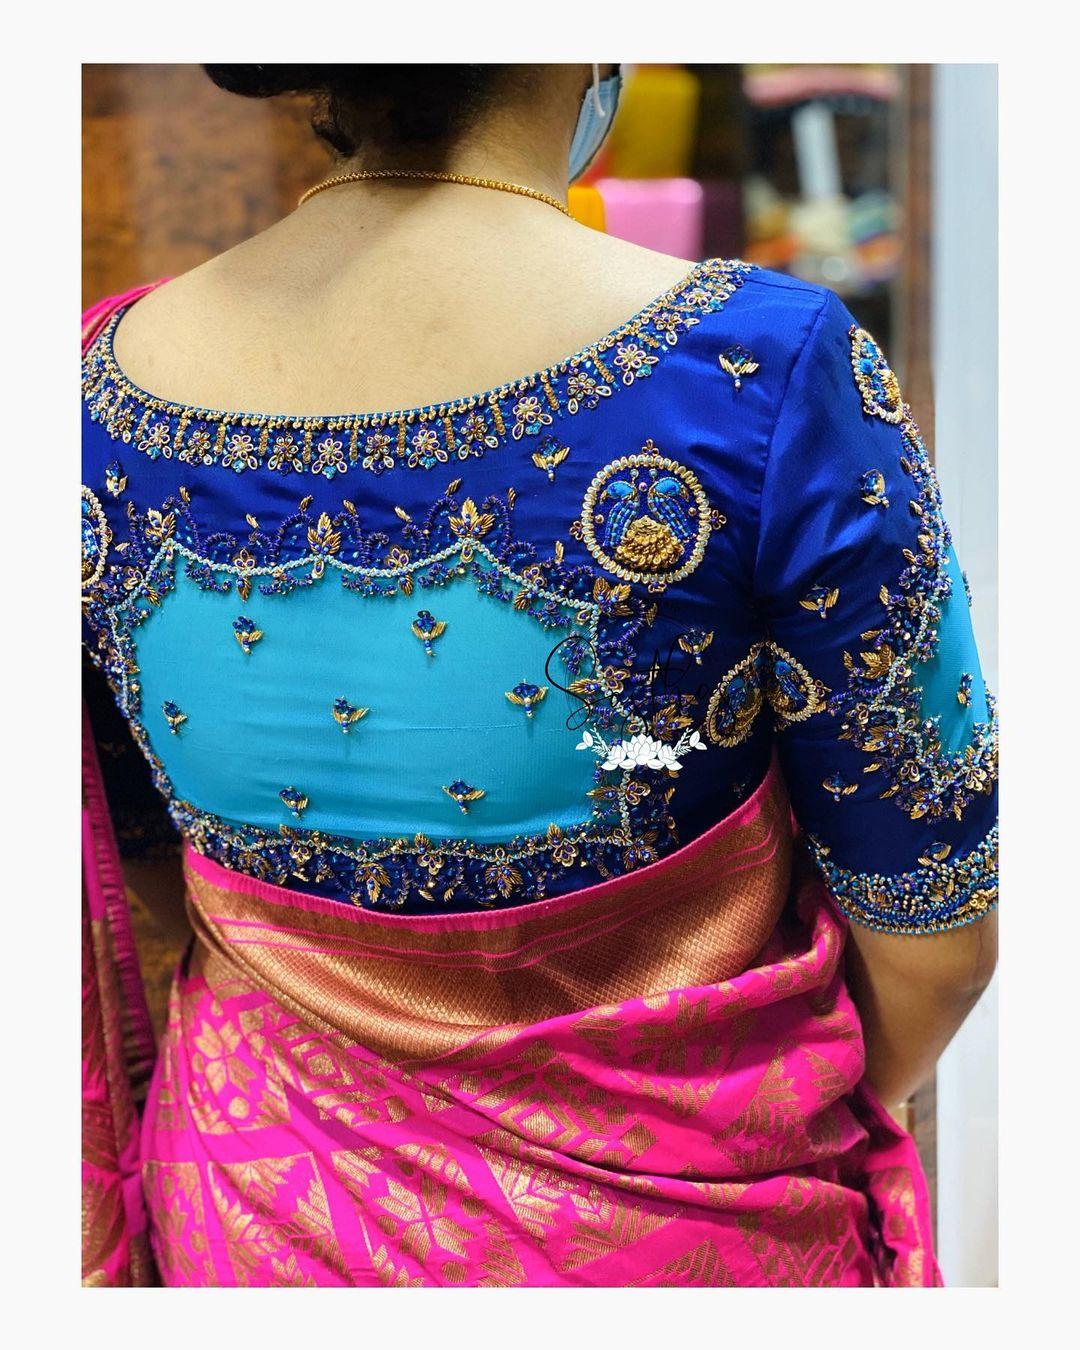 Stunning blue color blouse sleeve design with floral zardosi work.  2021-05-07